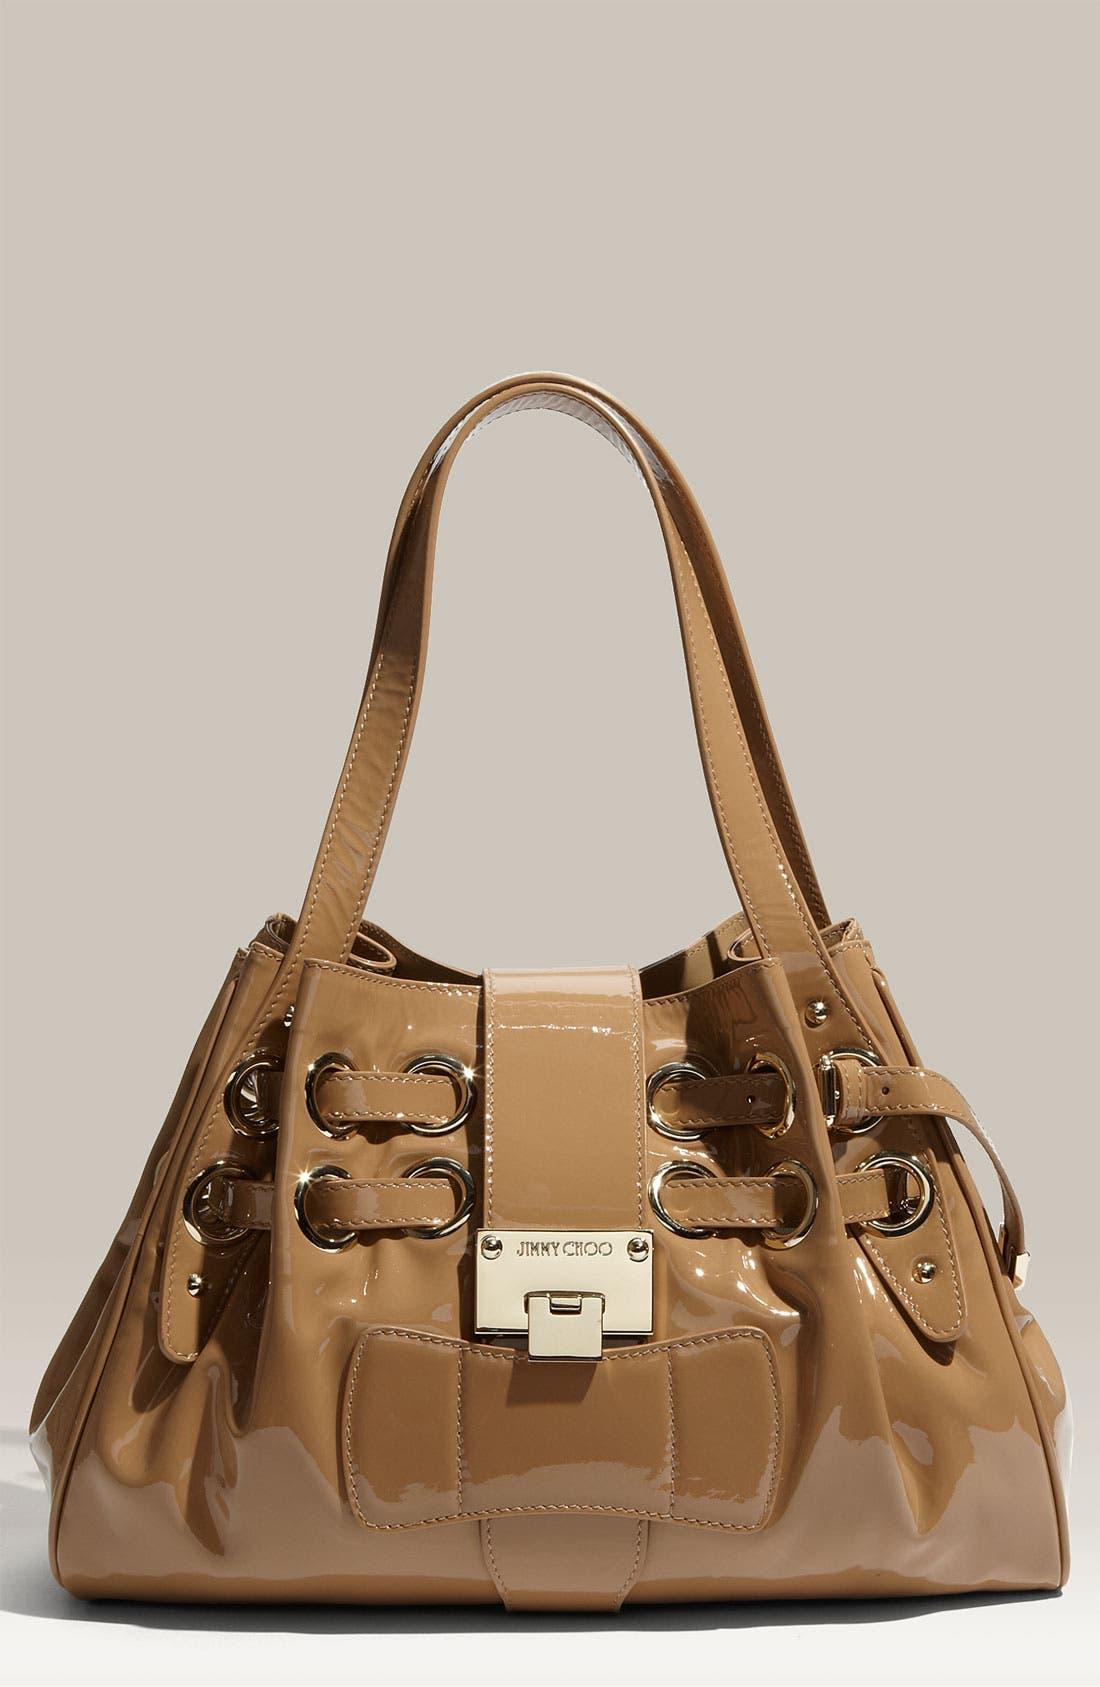 Main Image - Jimmy Choo 'Small' Patent Leather Shopper